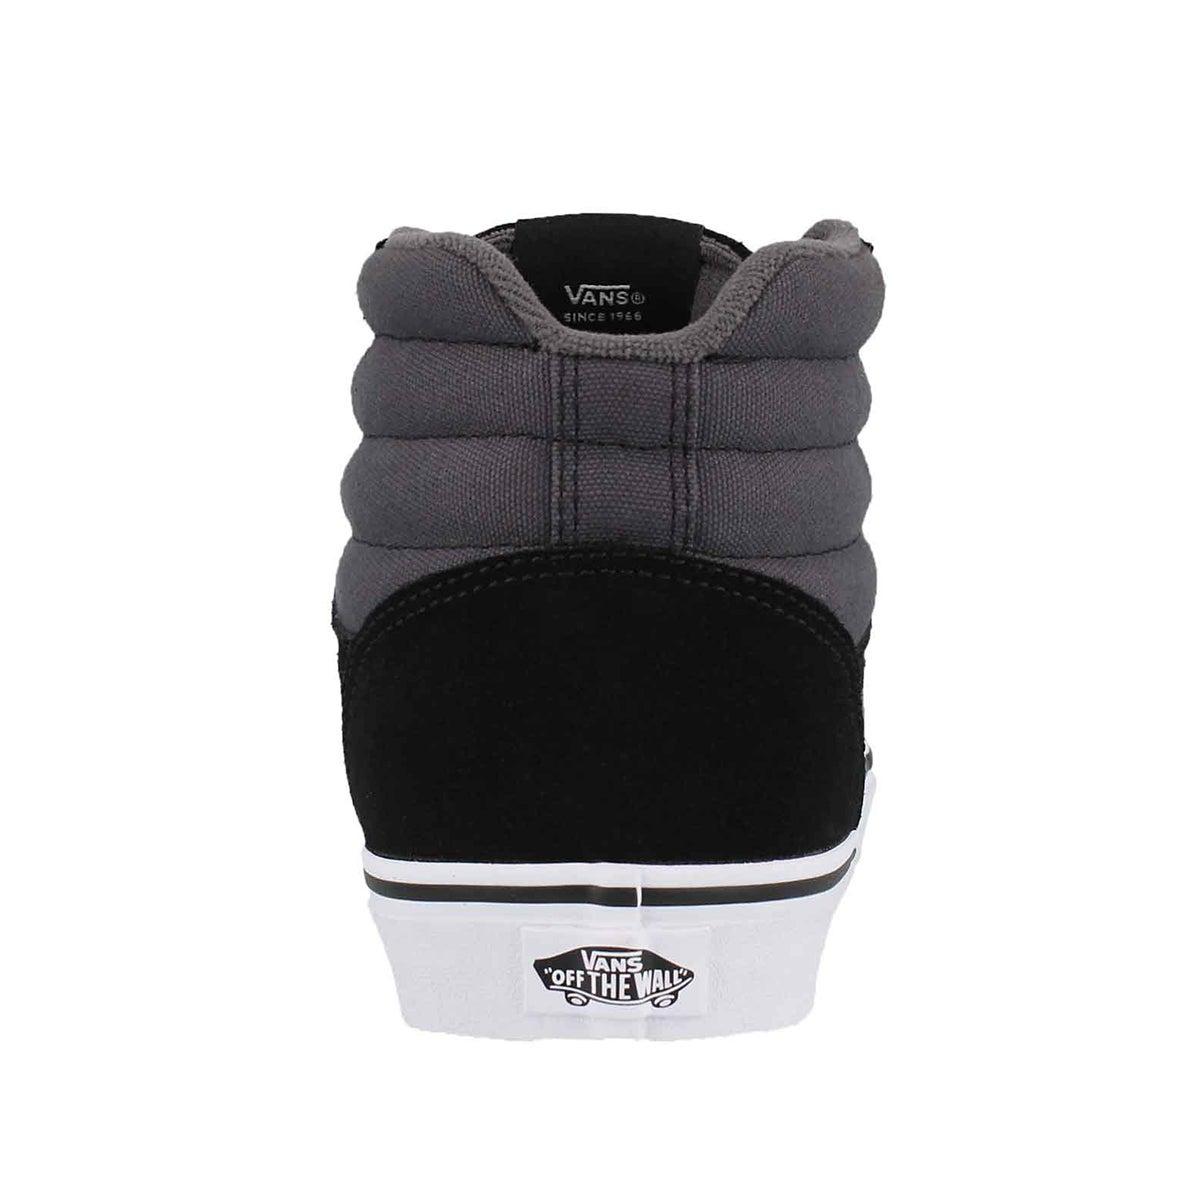 Mns Ward Hi blk/asphalt lace up sneaker